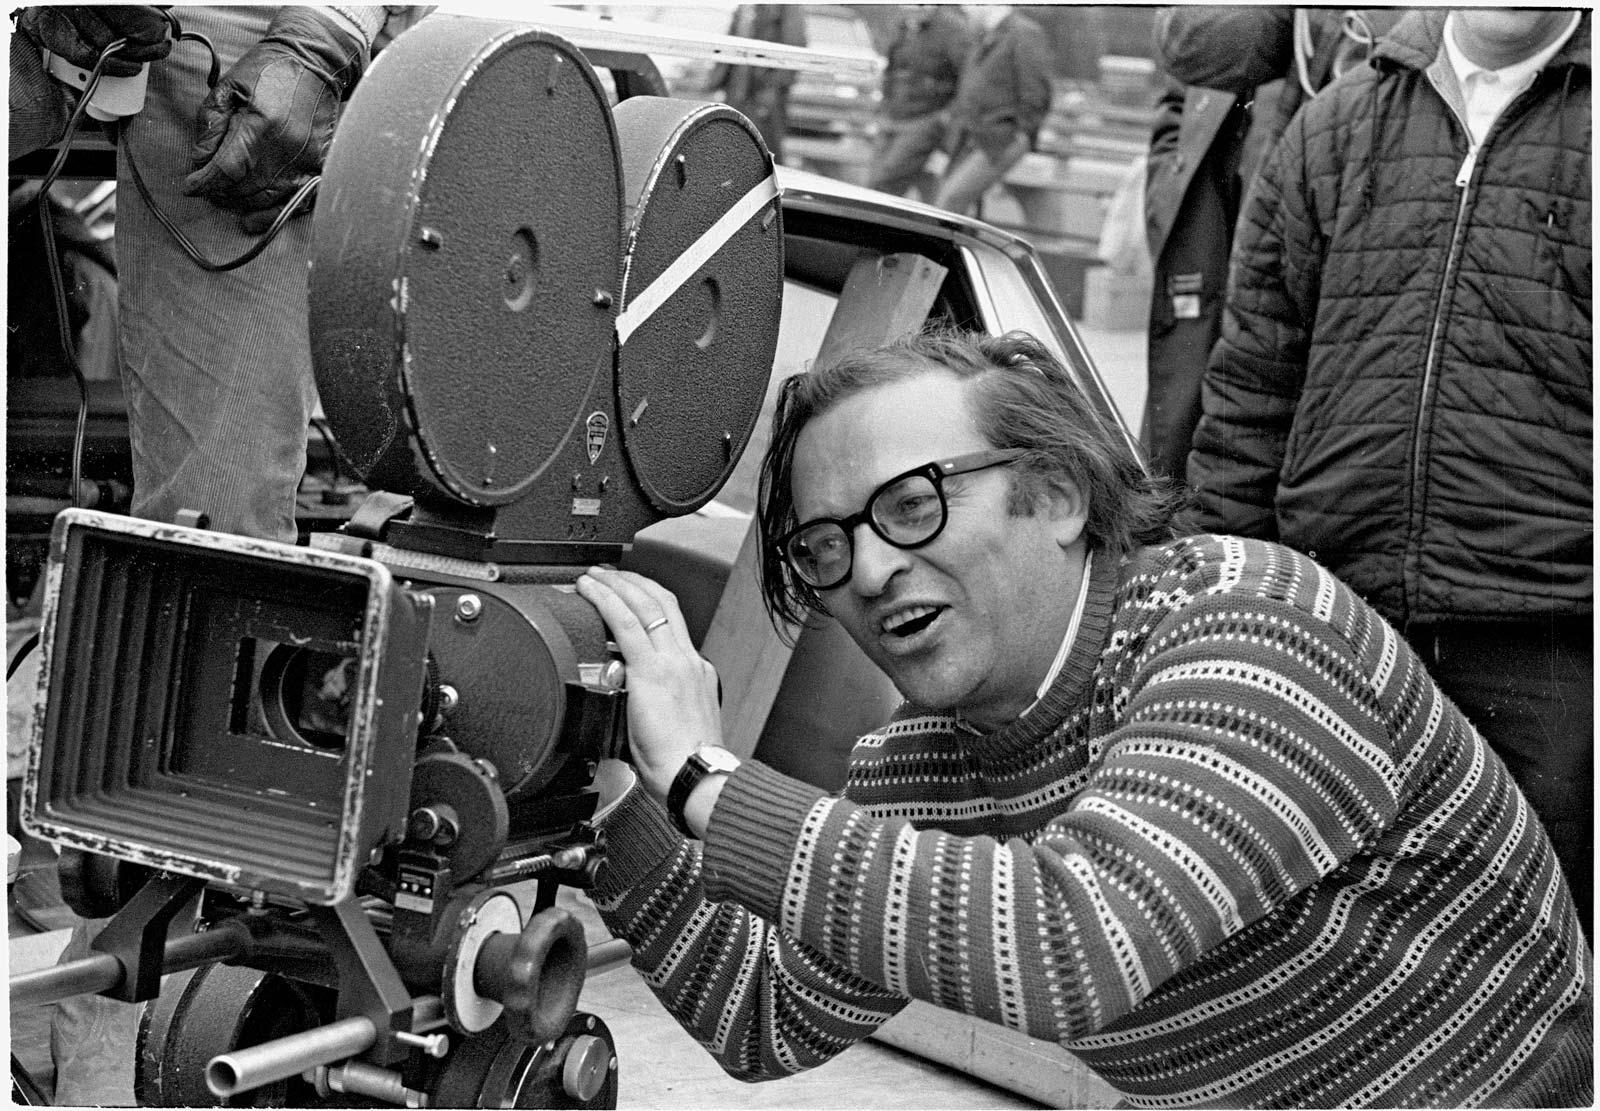 Sidney Lumet's filmography